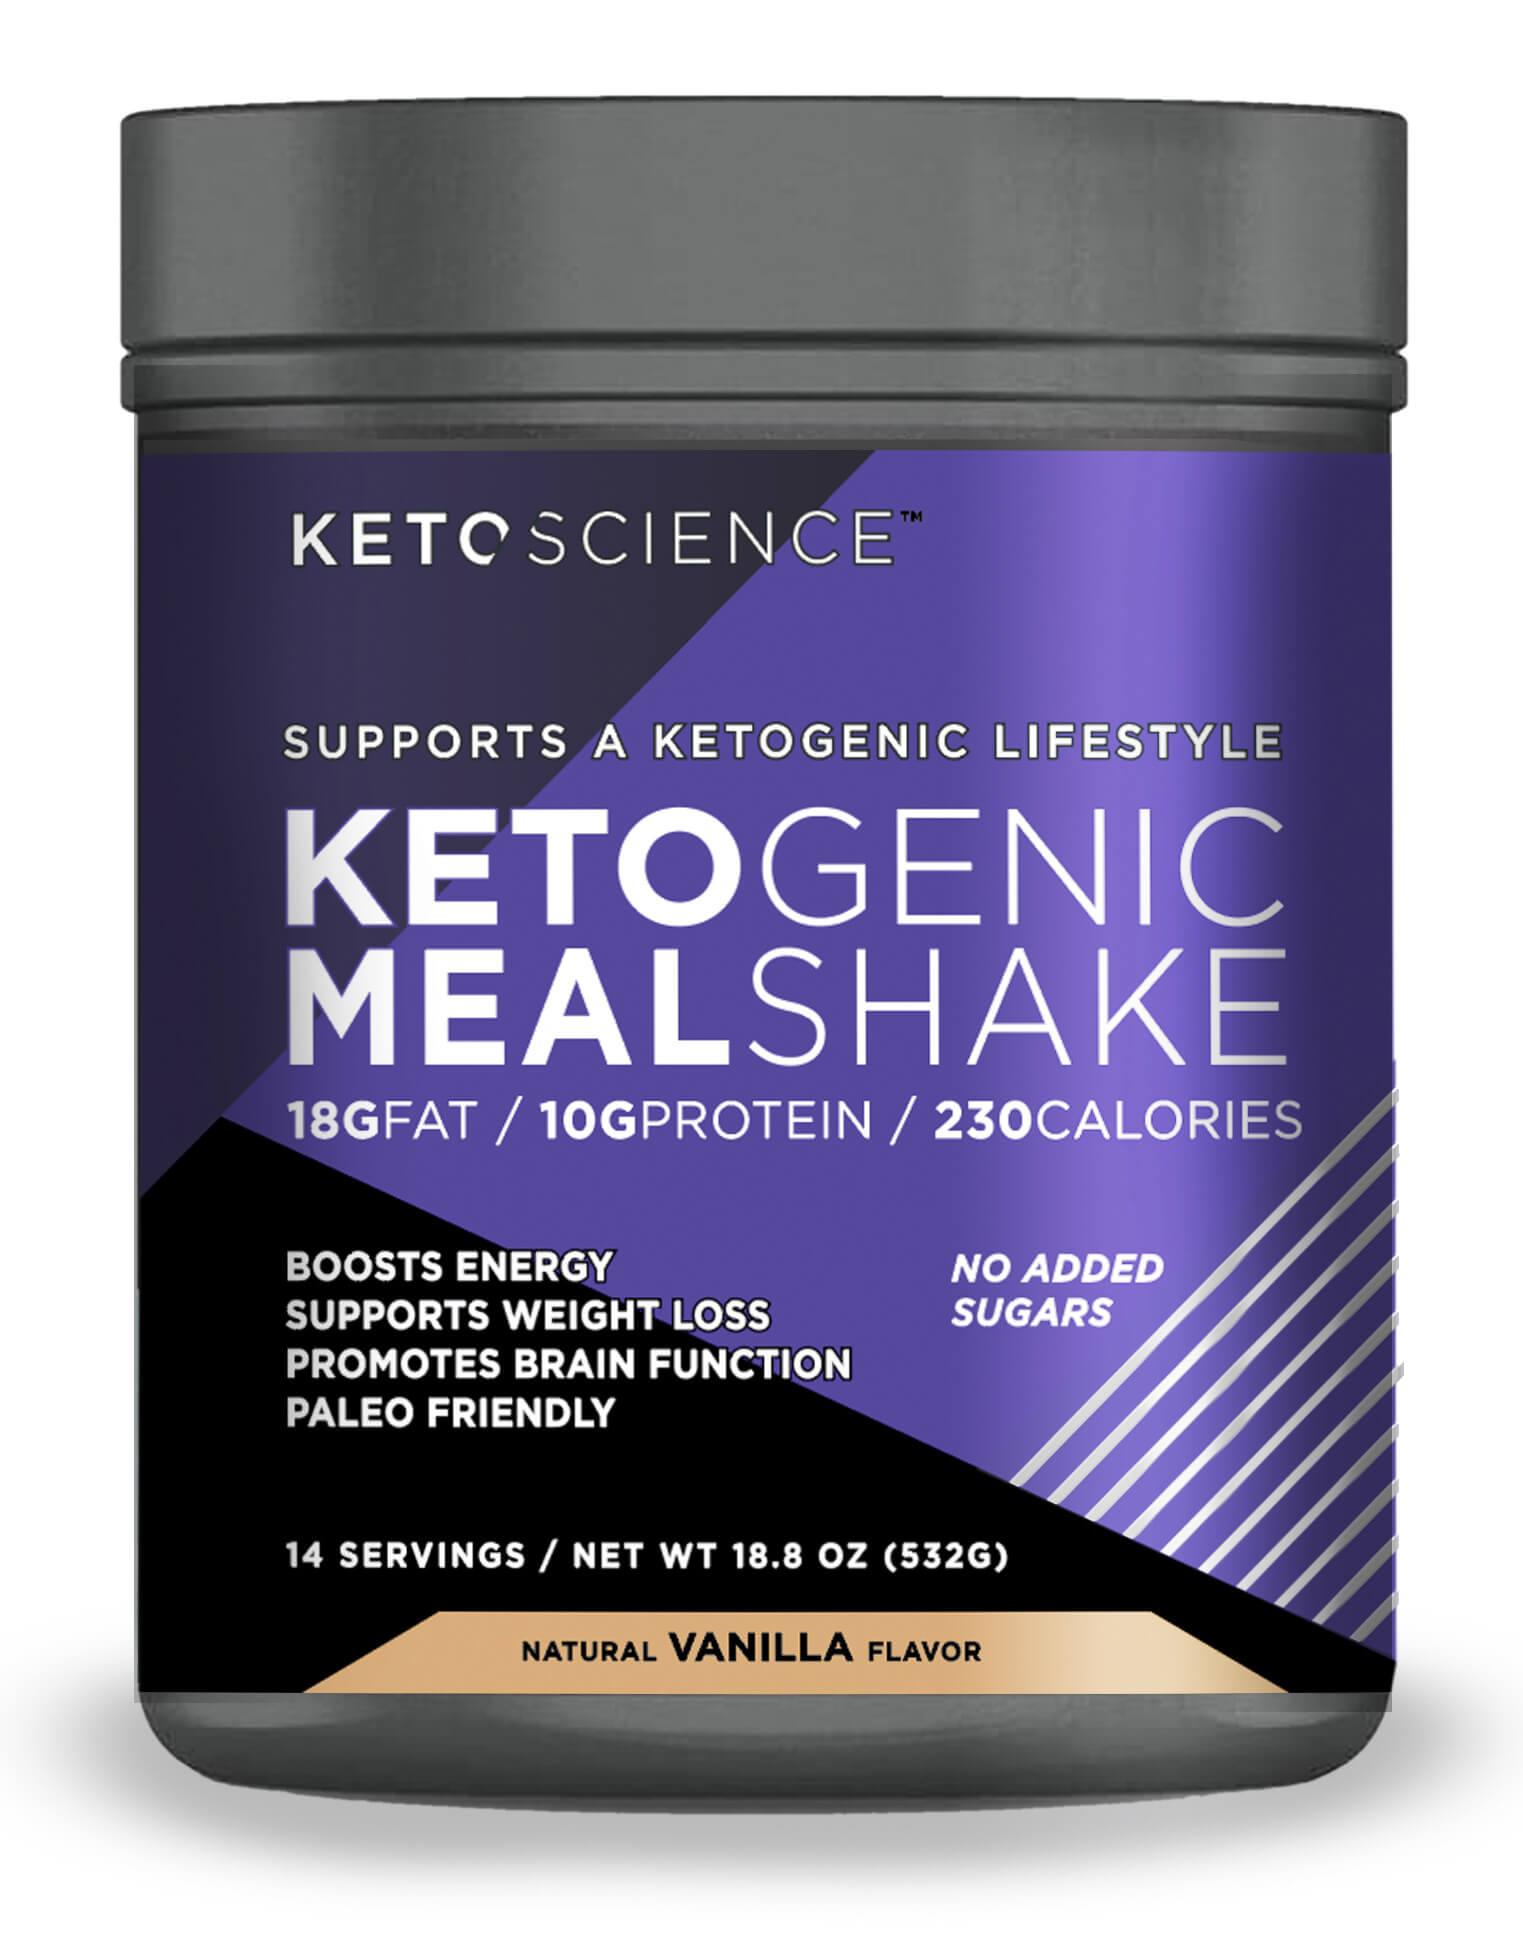 Weight Loss Shakes At Walmart : weight, shakes, walmart, Science, Ketogenic, Shake, Vanilla, Dietary, Supplement,, Replacement,, Weight, Loss,, Intermittent, Fasting,, Servings, Walmart.com